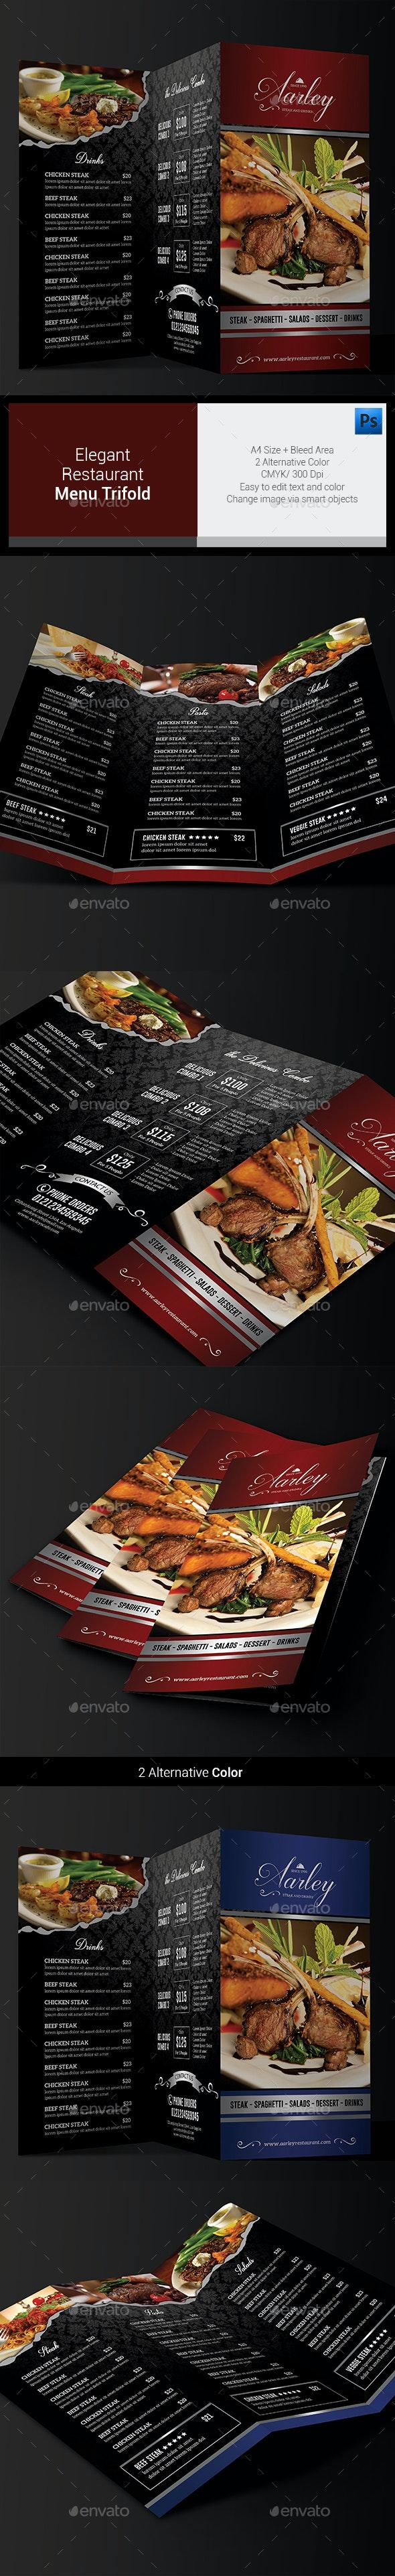 Elegant Restaurant Menu Trifold - Food Menus Print Templates